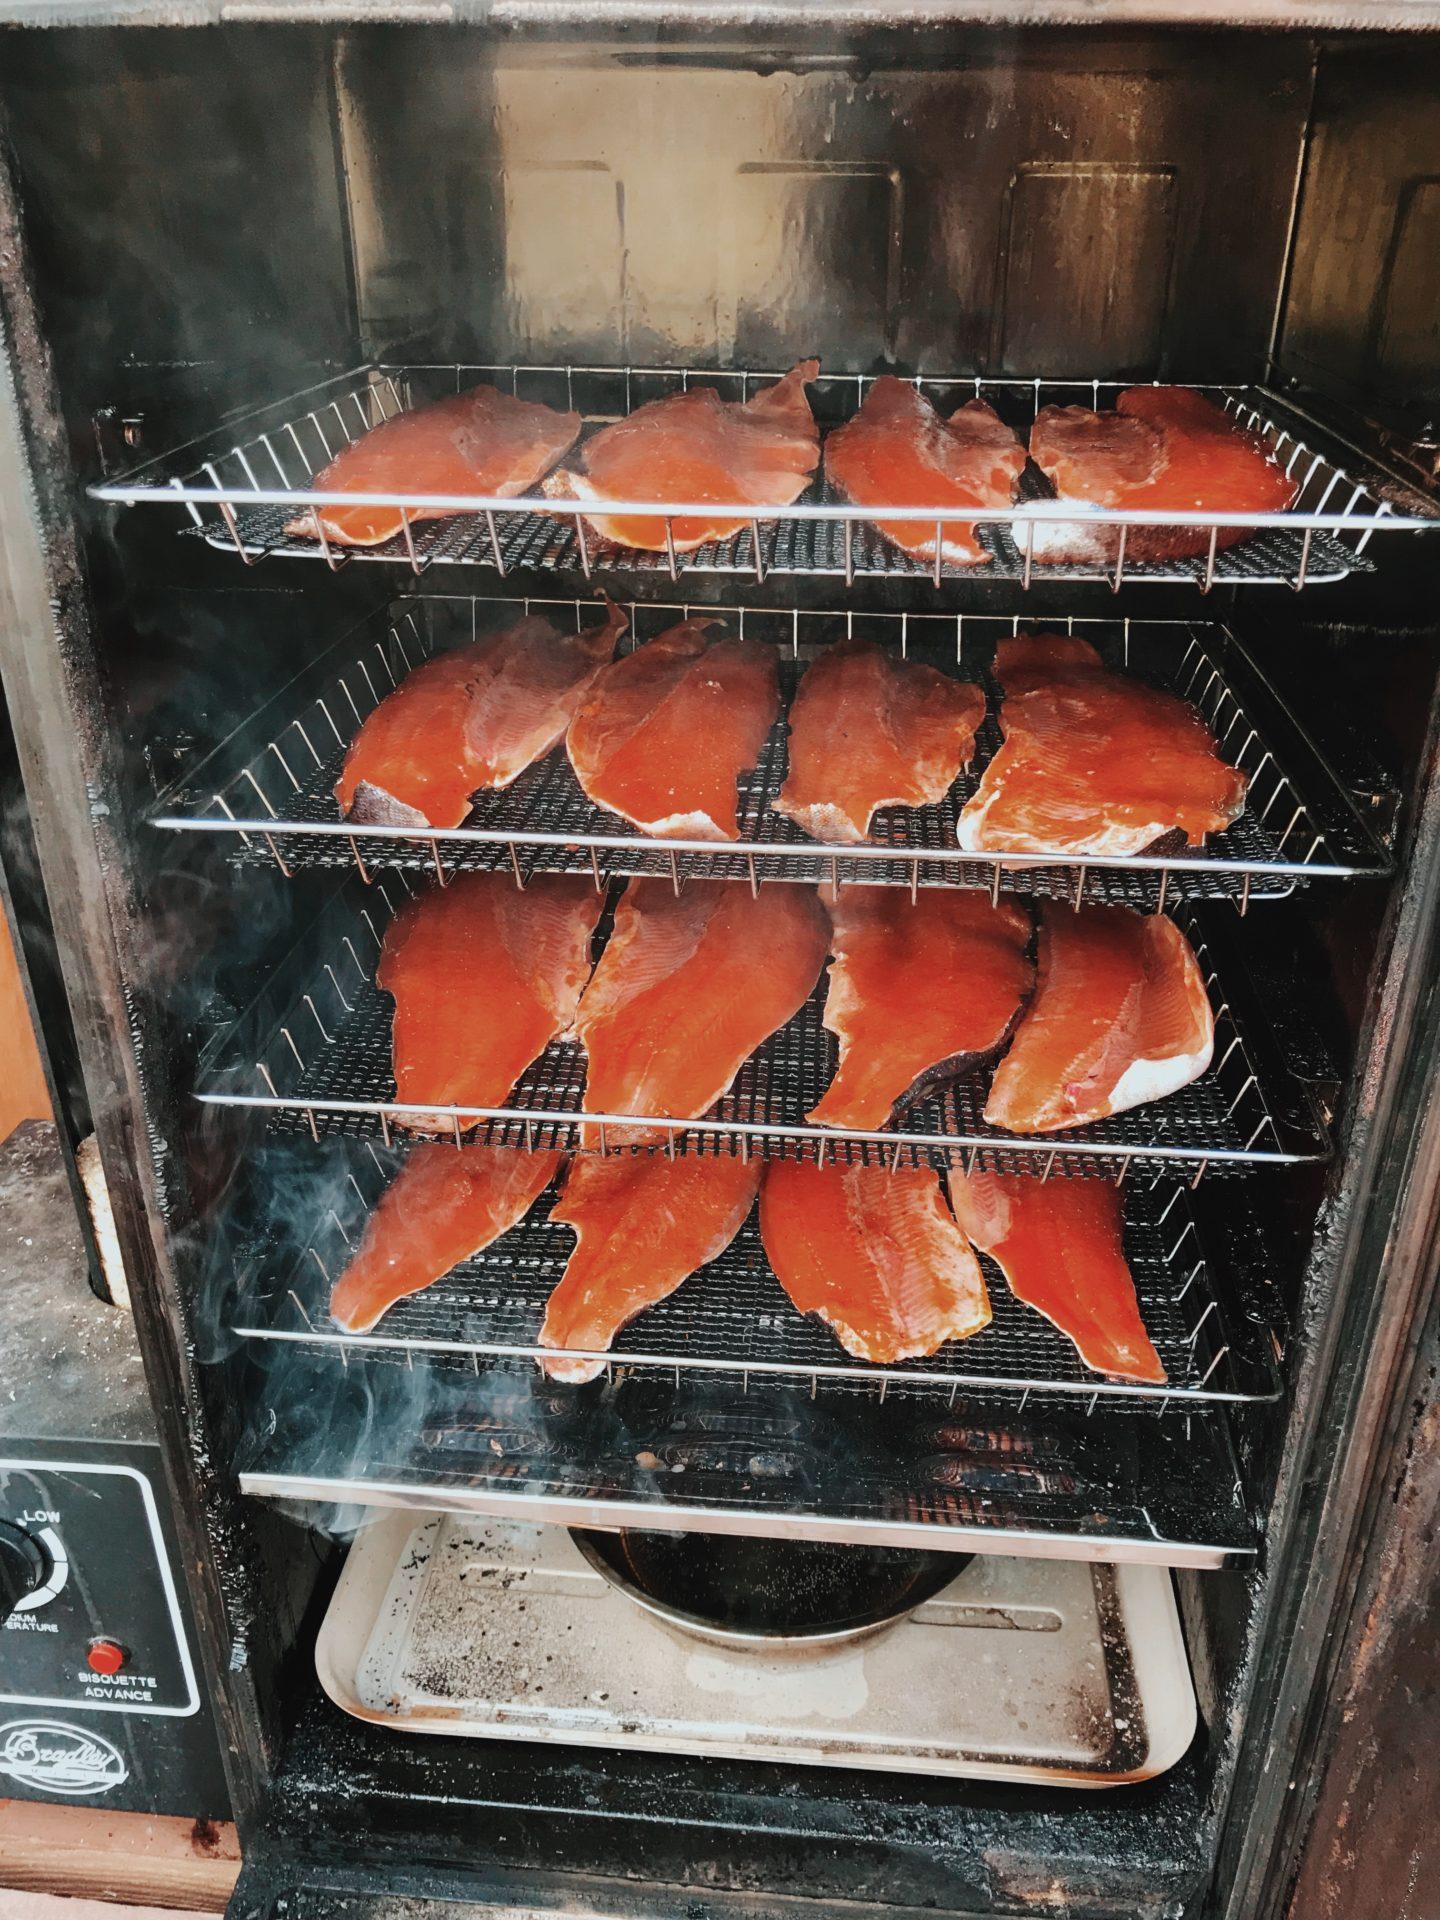 Smoked salmon. Credit: Raeanne O'Meara.